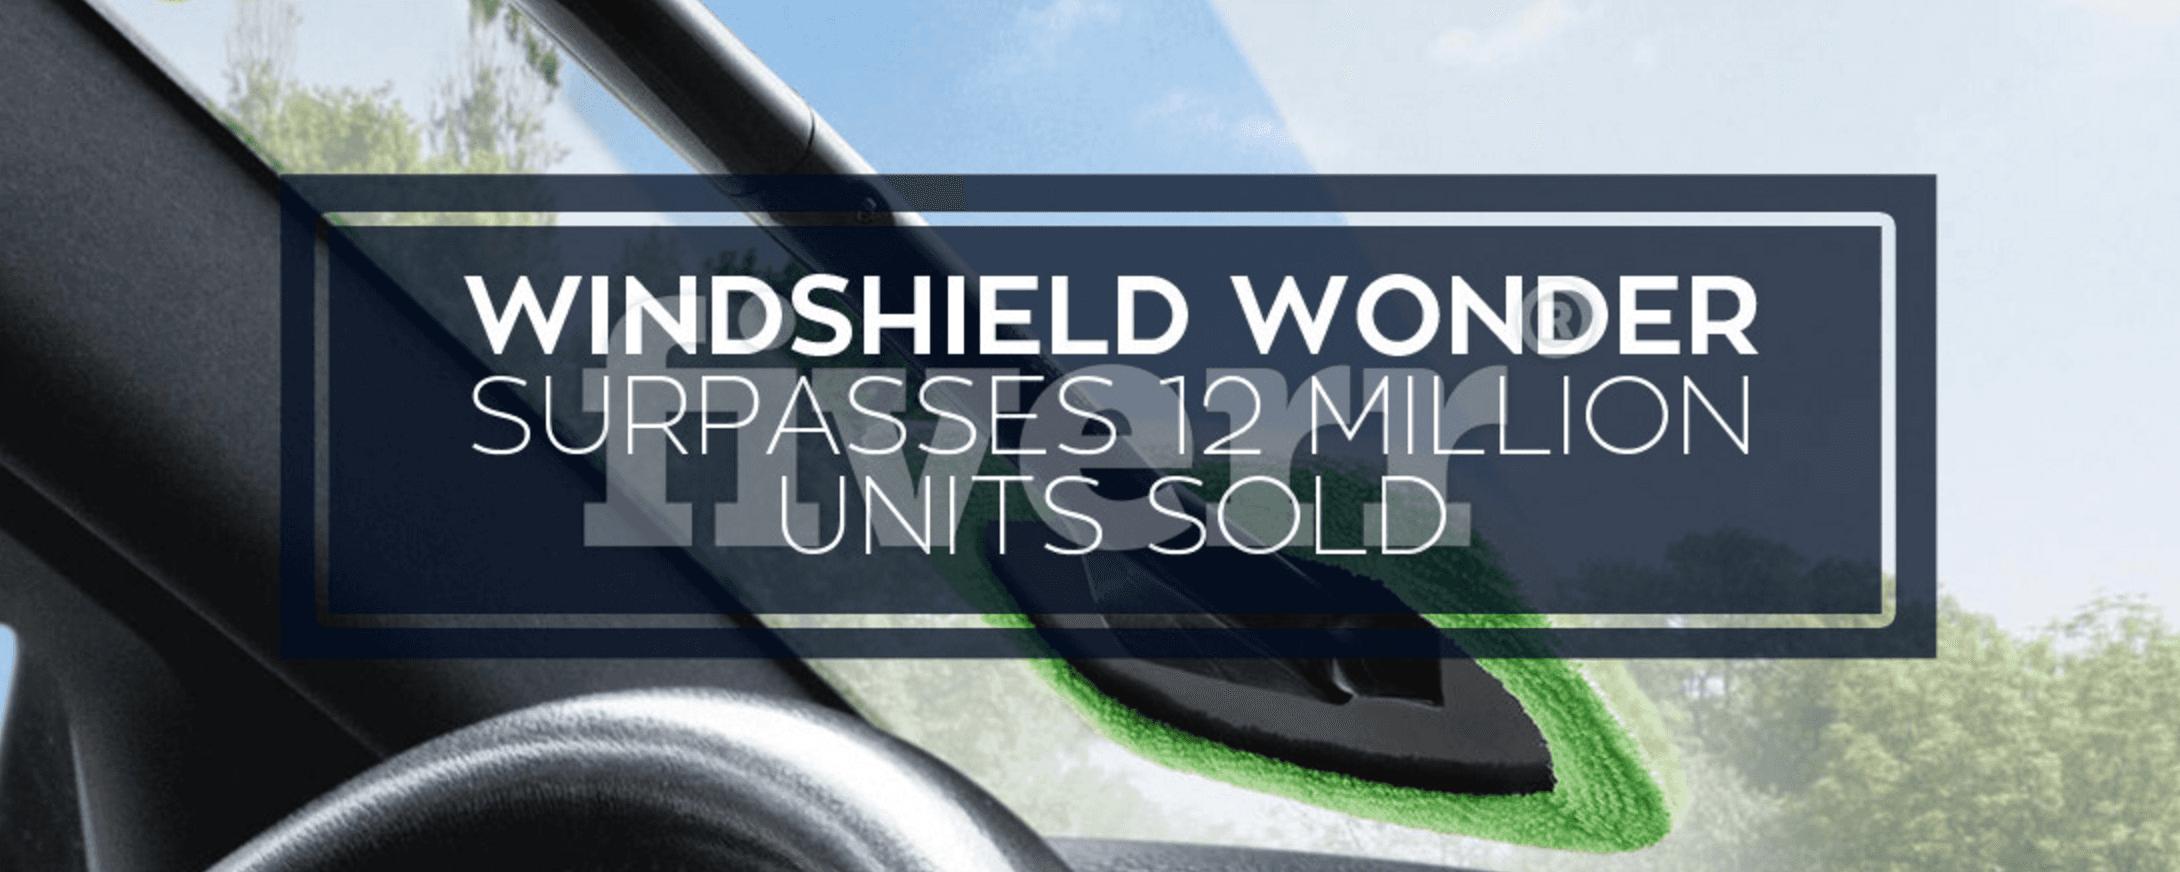 Windshield Wonder Surpasses 12 Million Sold Units